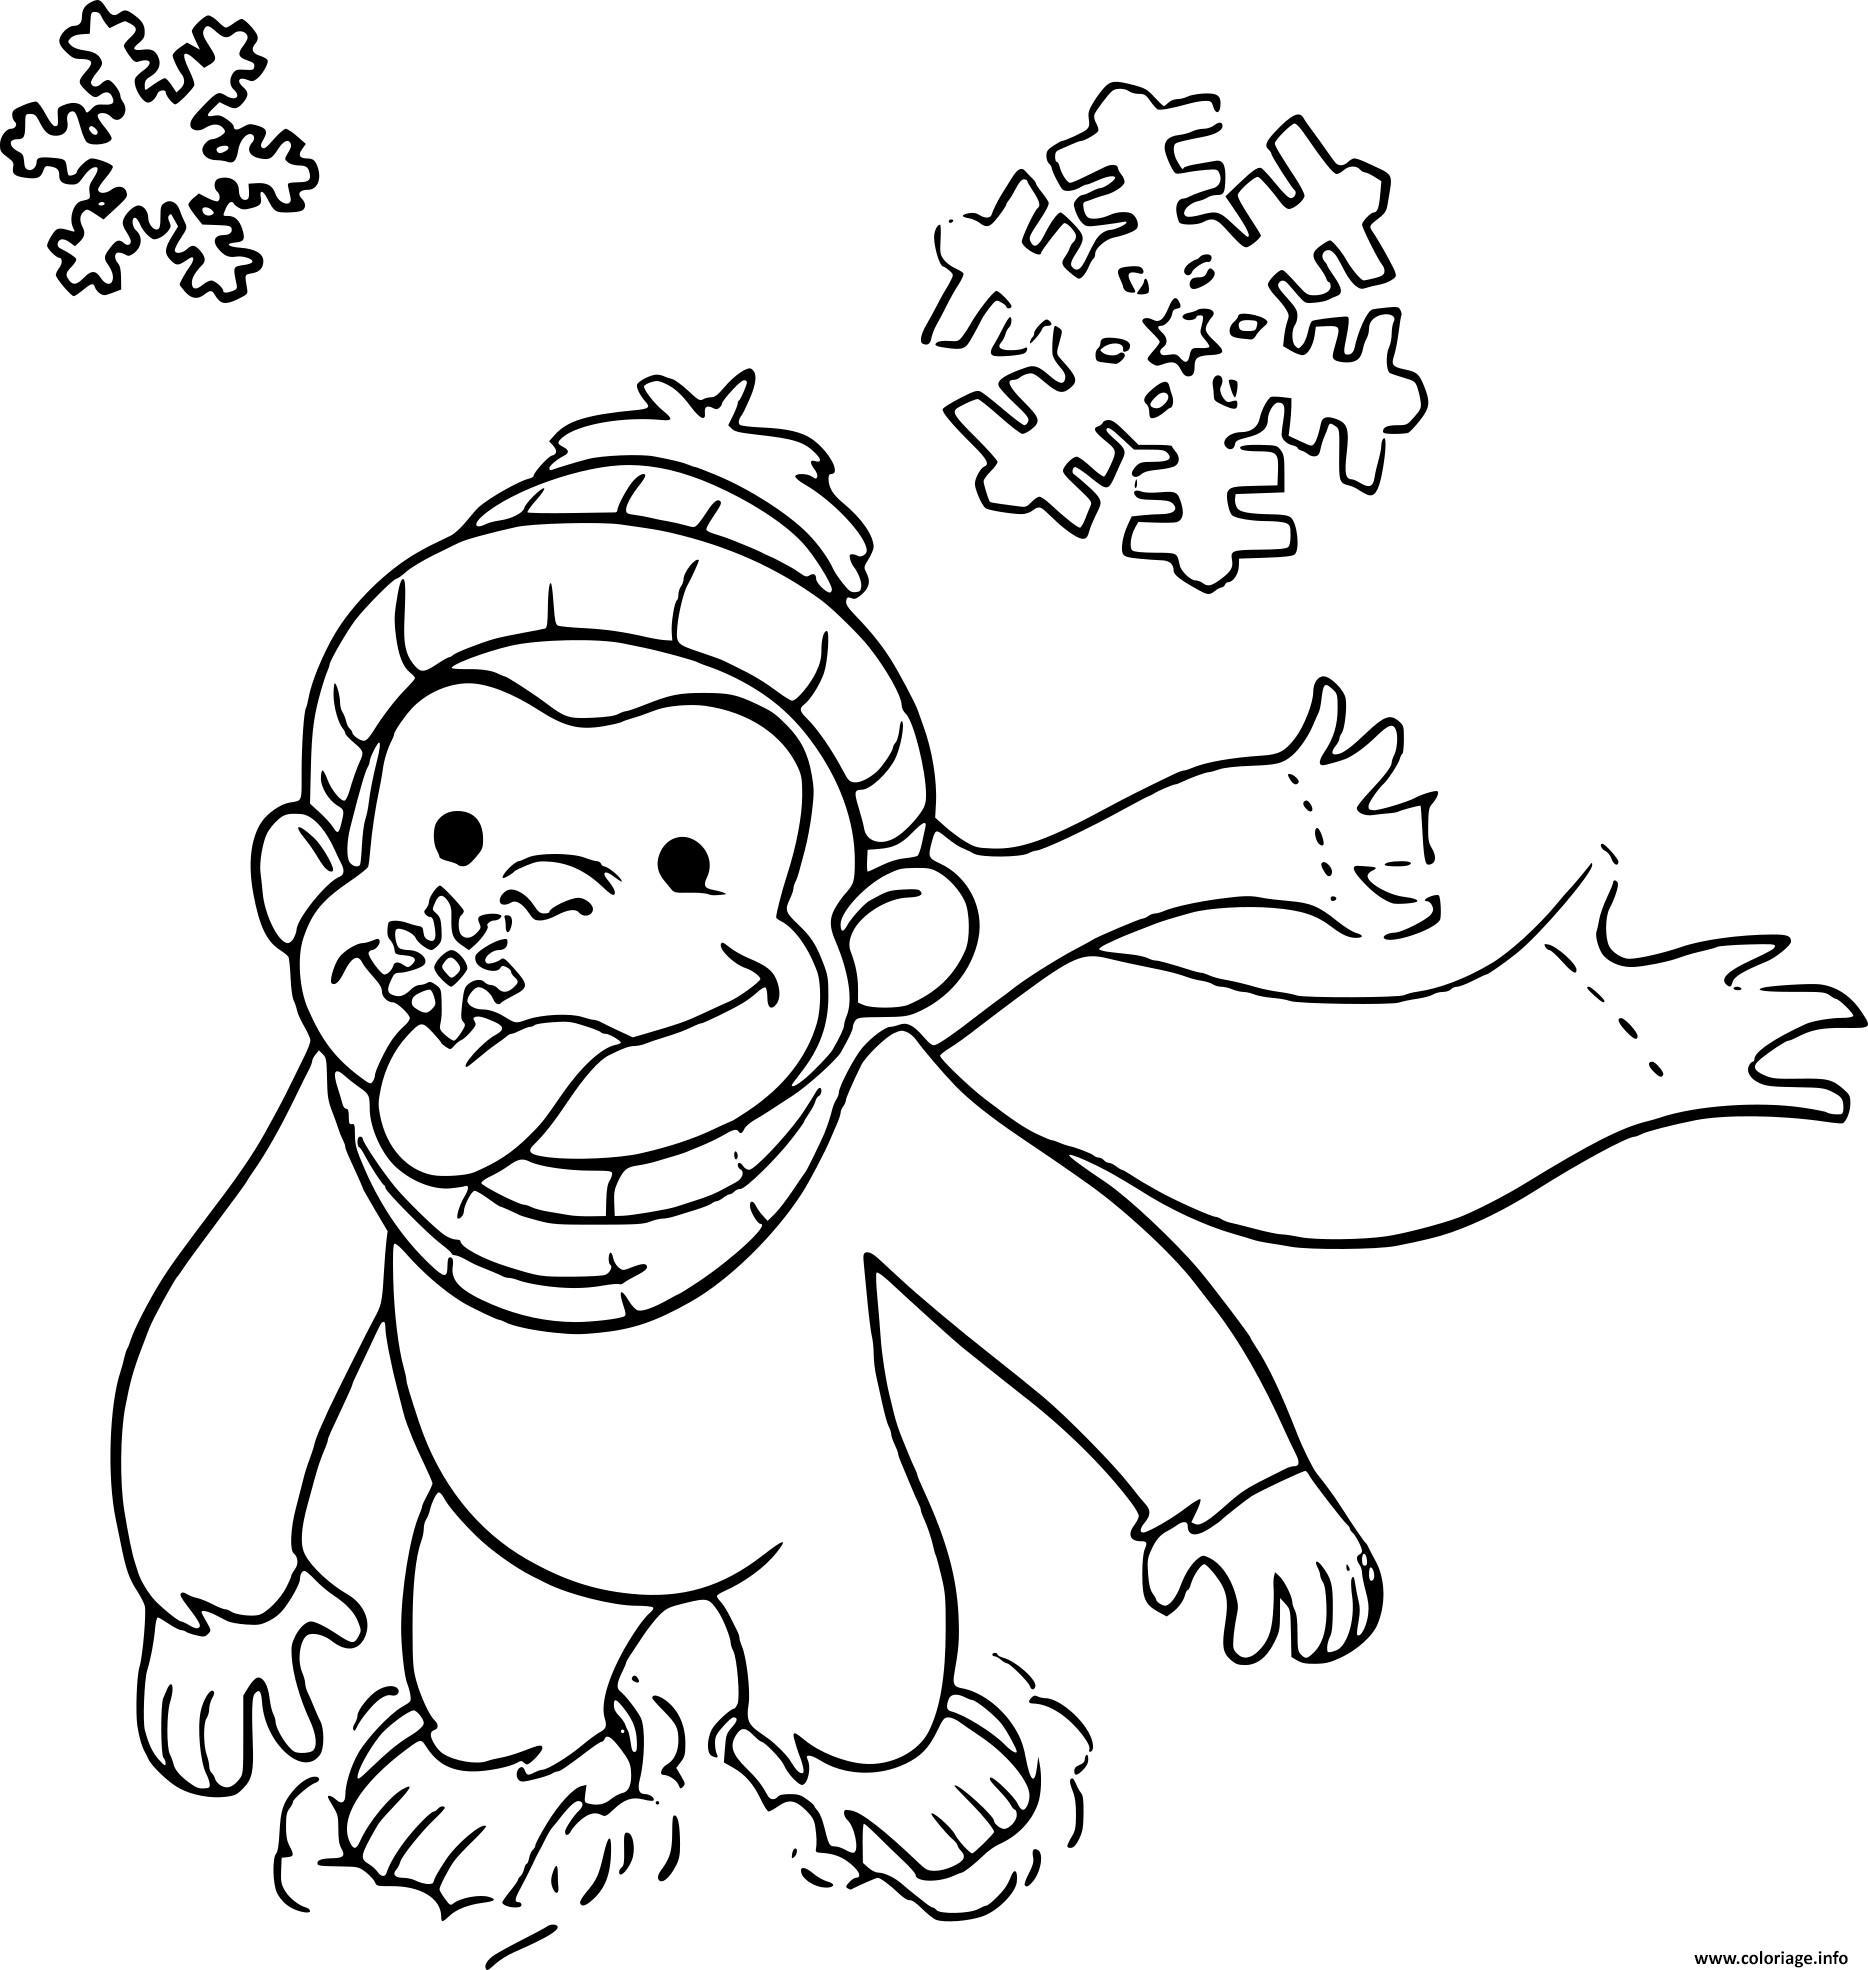 Coloriage singe facile sur la neige - Dessin de neige ...